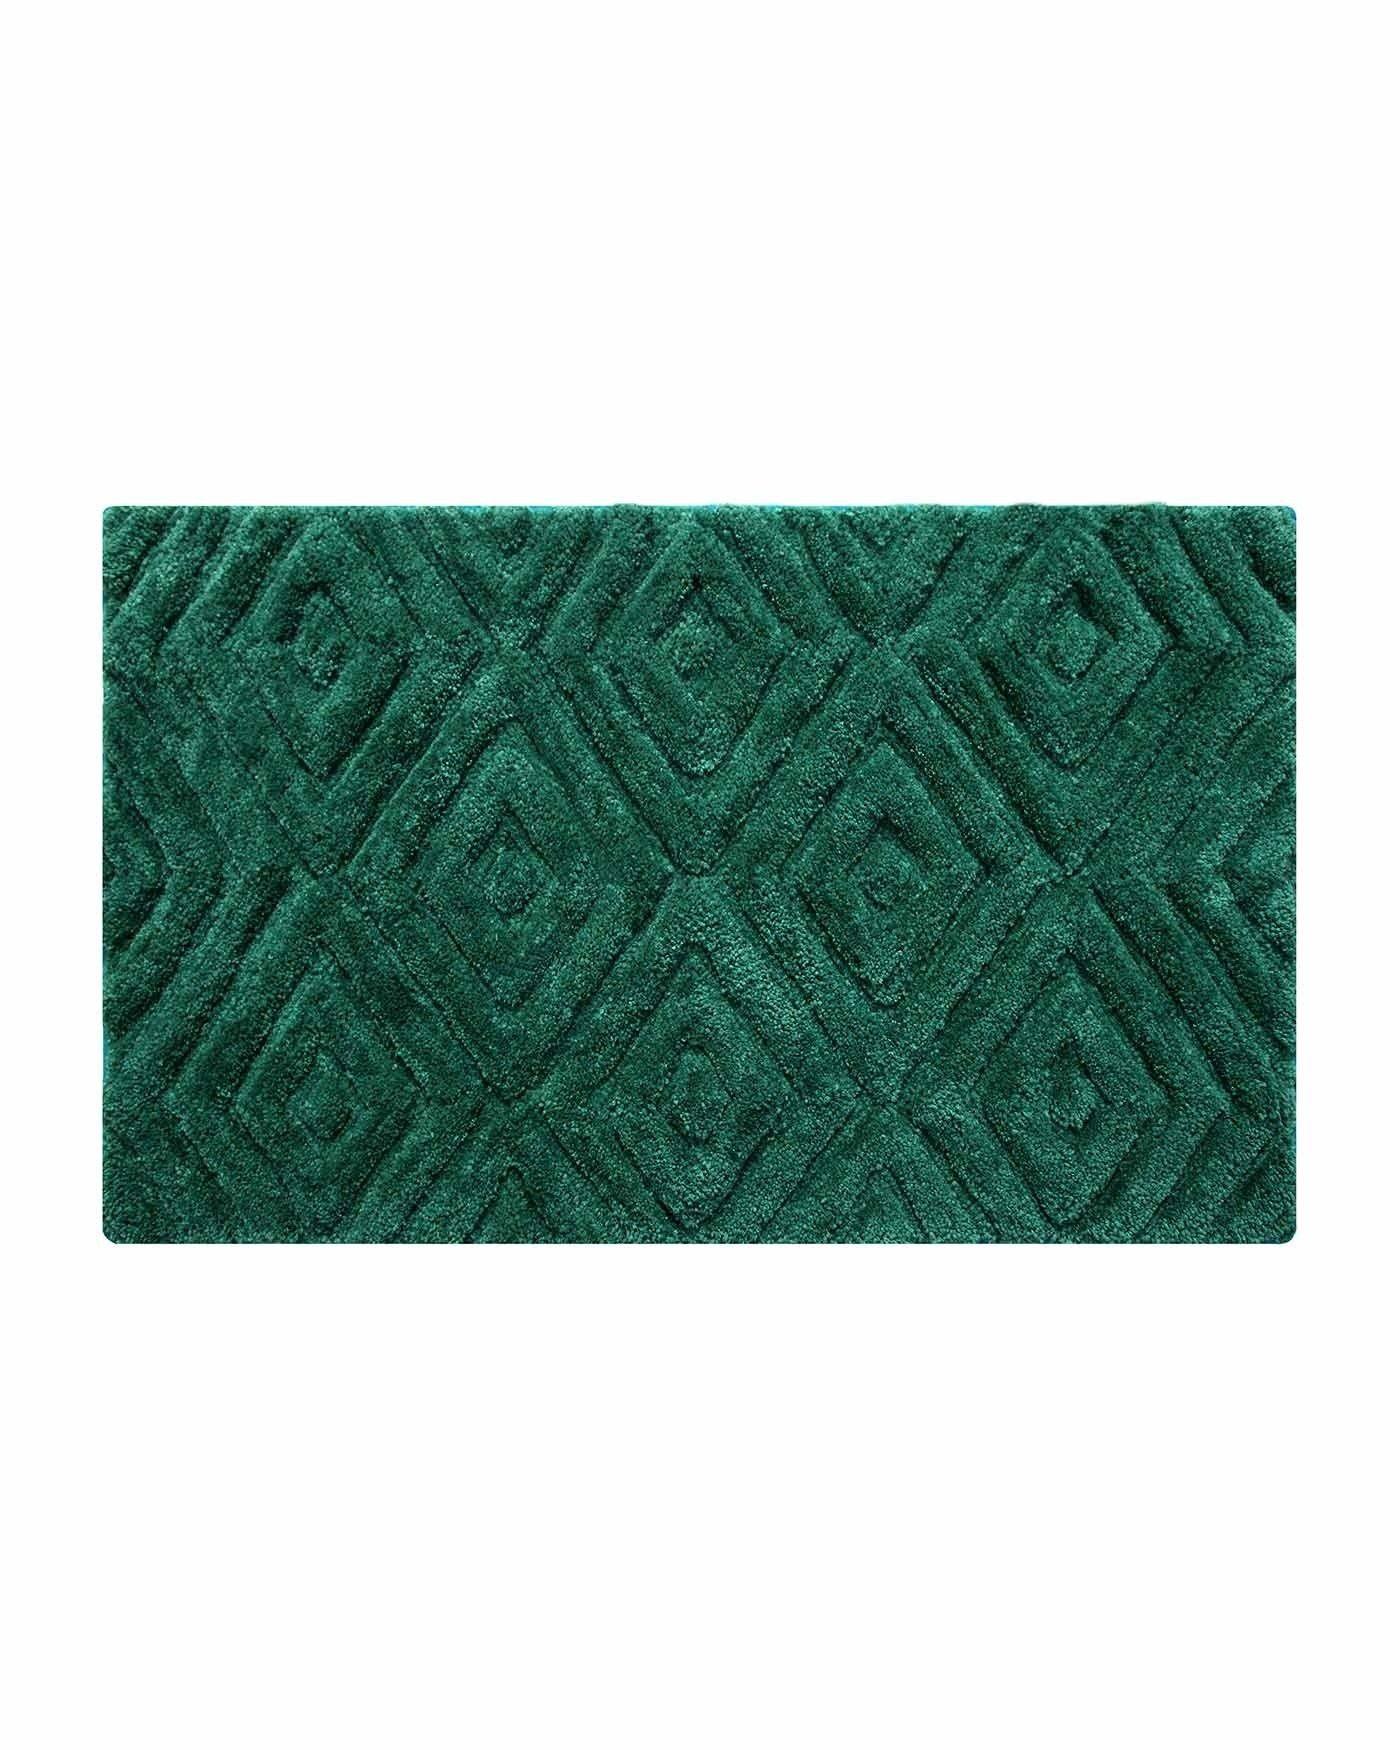 Emerald Green Super Absorbent Thick Pile Ikat Non Slip Bath Mat